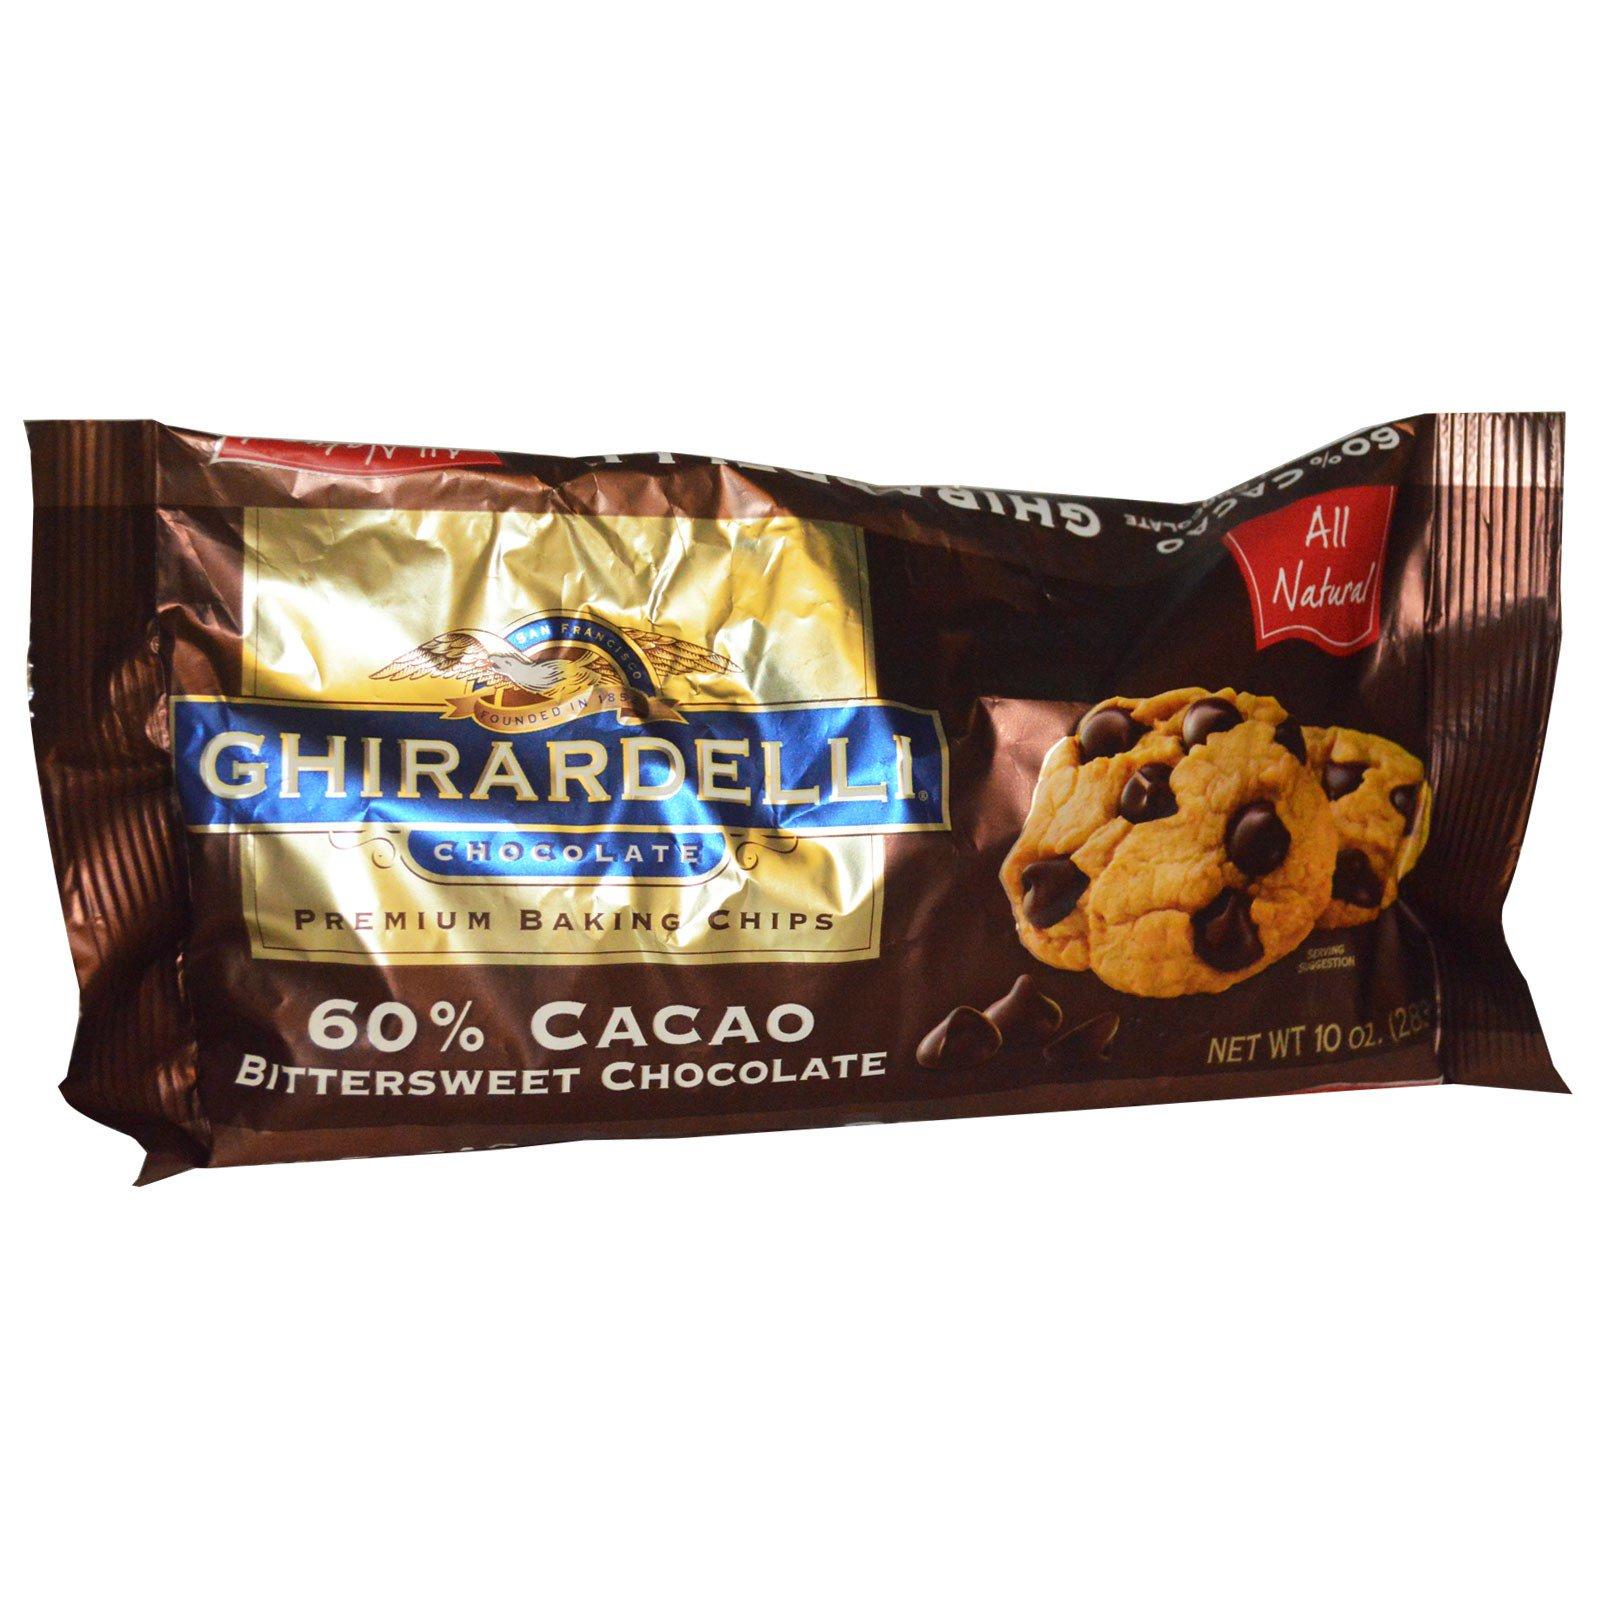 Ghirardelli, Ghirardelli, запеченные премиум-чипсы, шоколад с горько-сладким шоколадом с 60% какао, 10 унций (283 г)